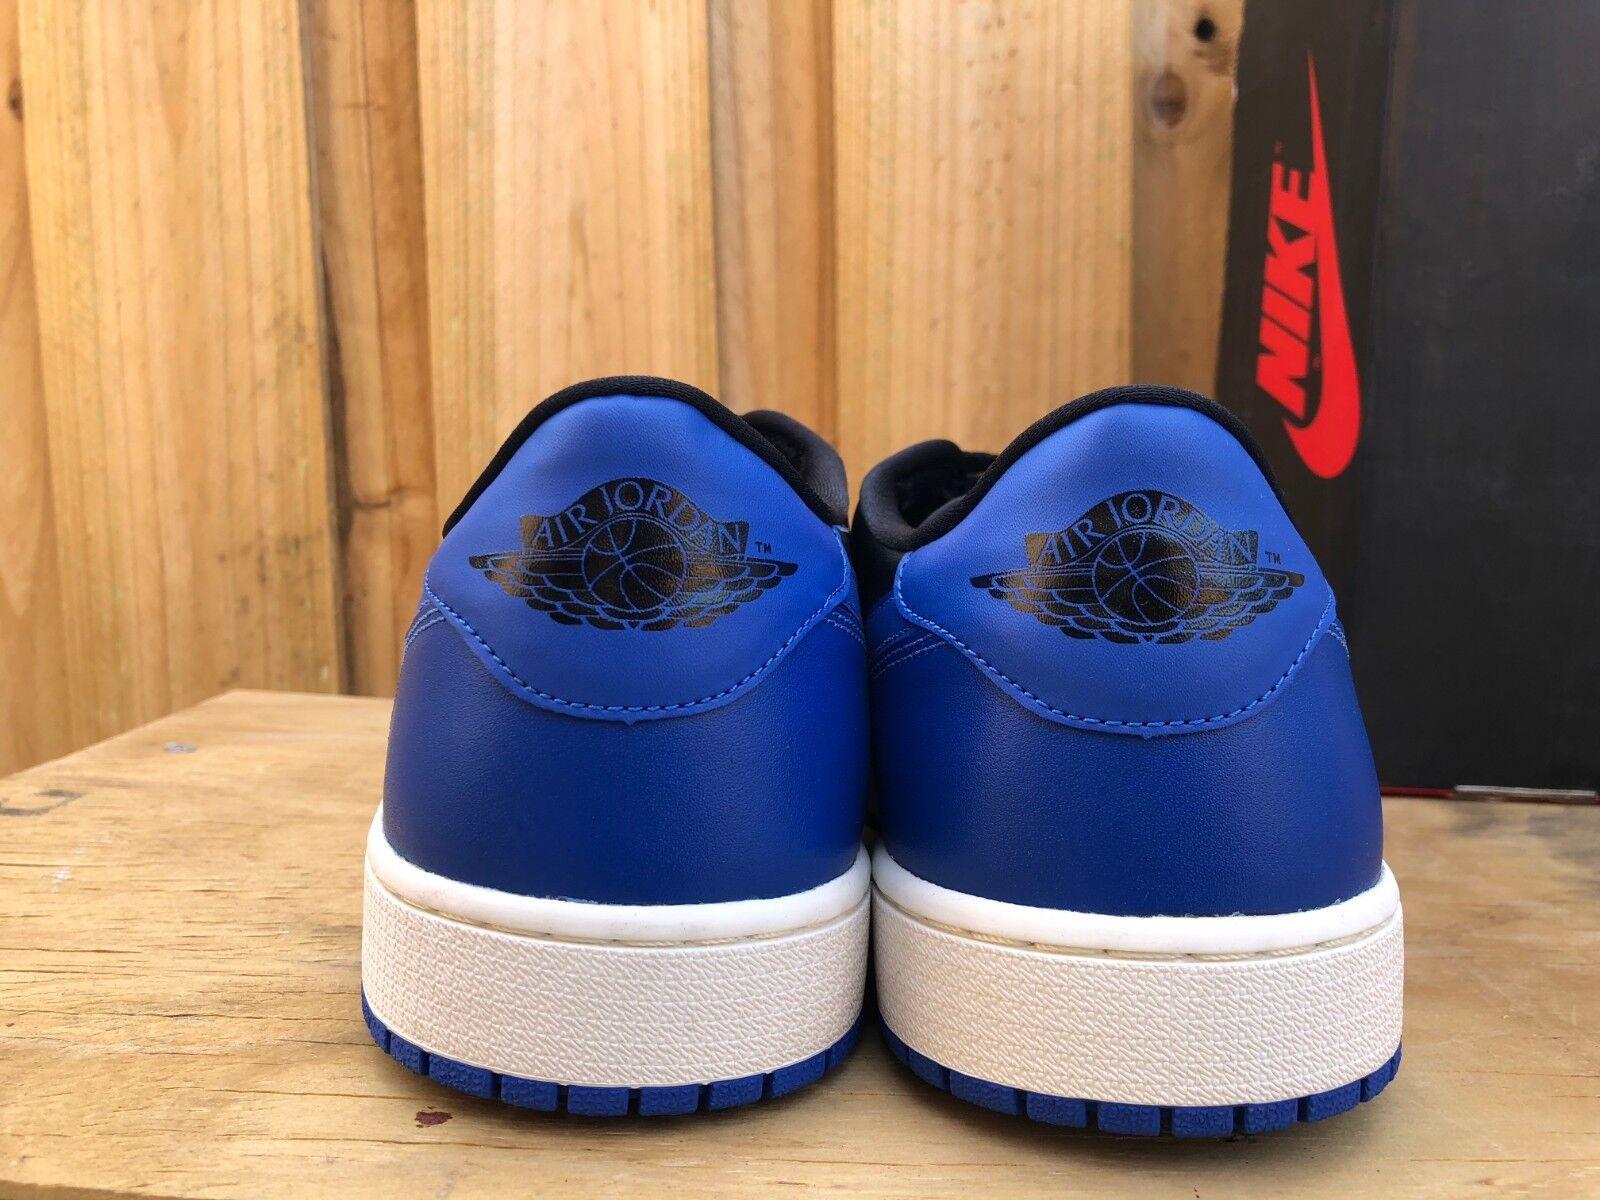 Air Jordan 1 Retro OG Royal 705329004 Blue Low Size 18 705329004 Royal Dead Stock. VERY RARE! 8c7cf0